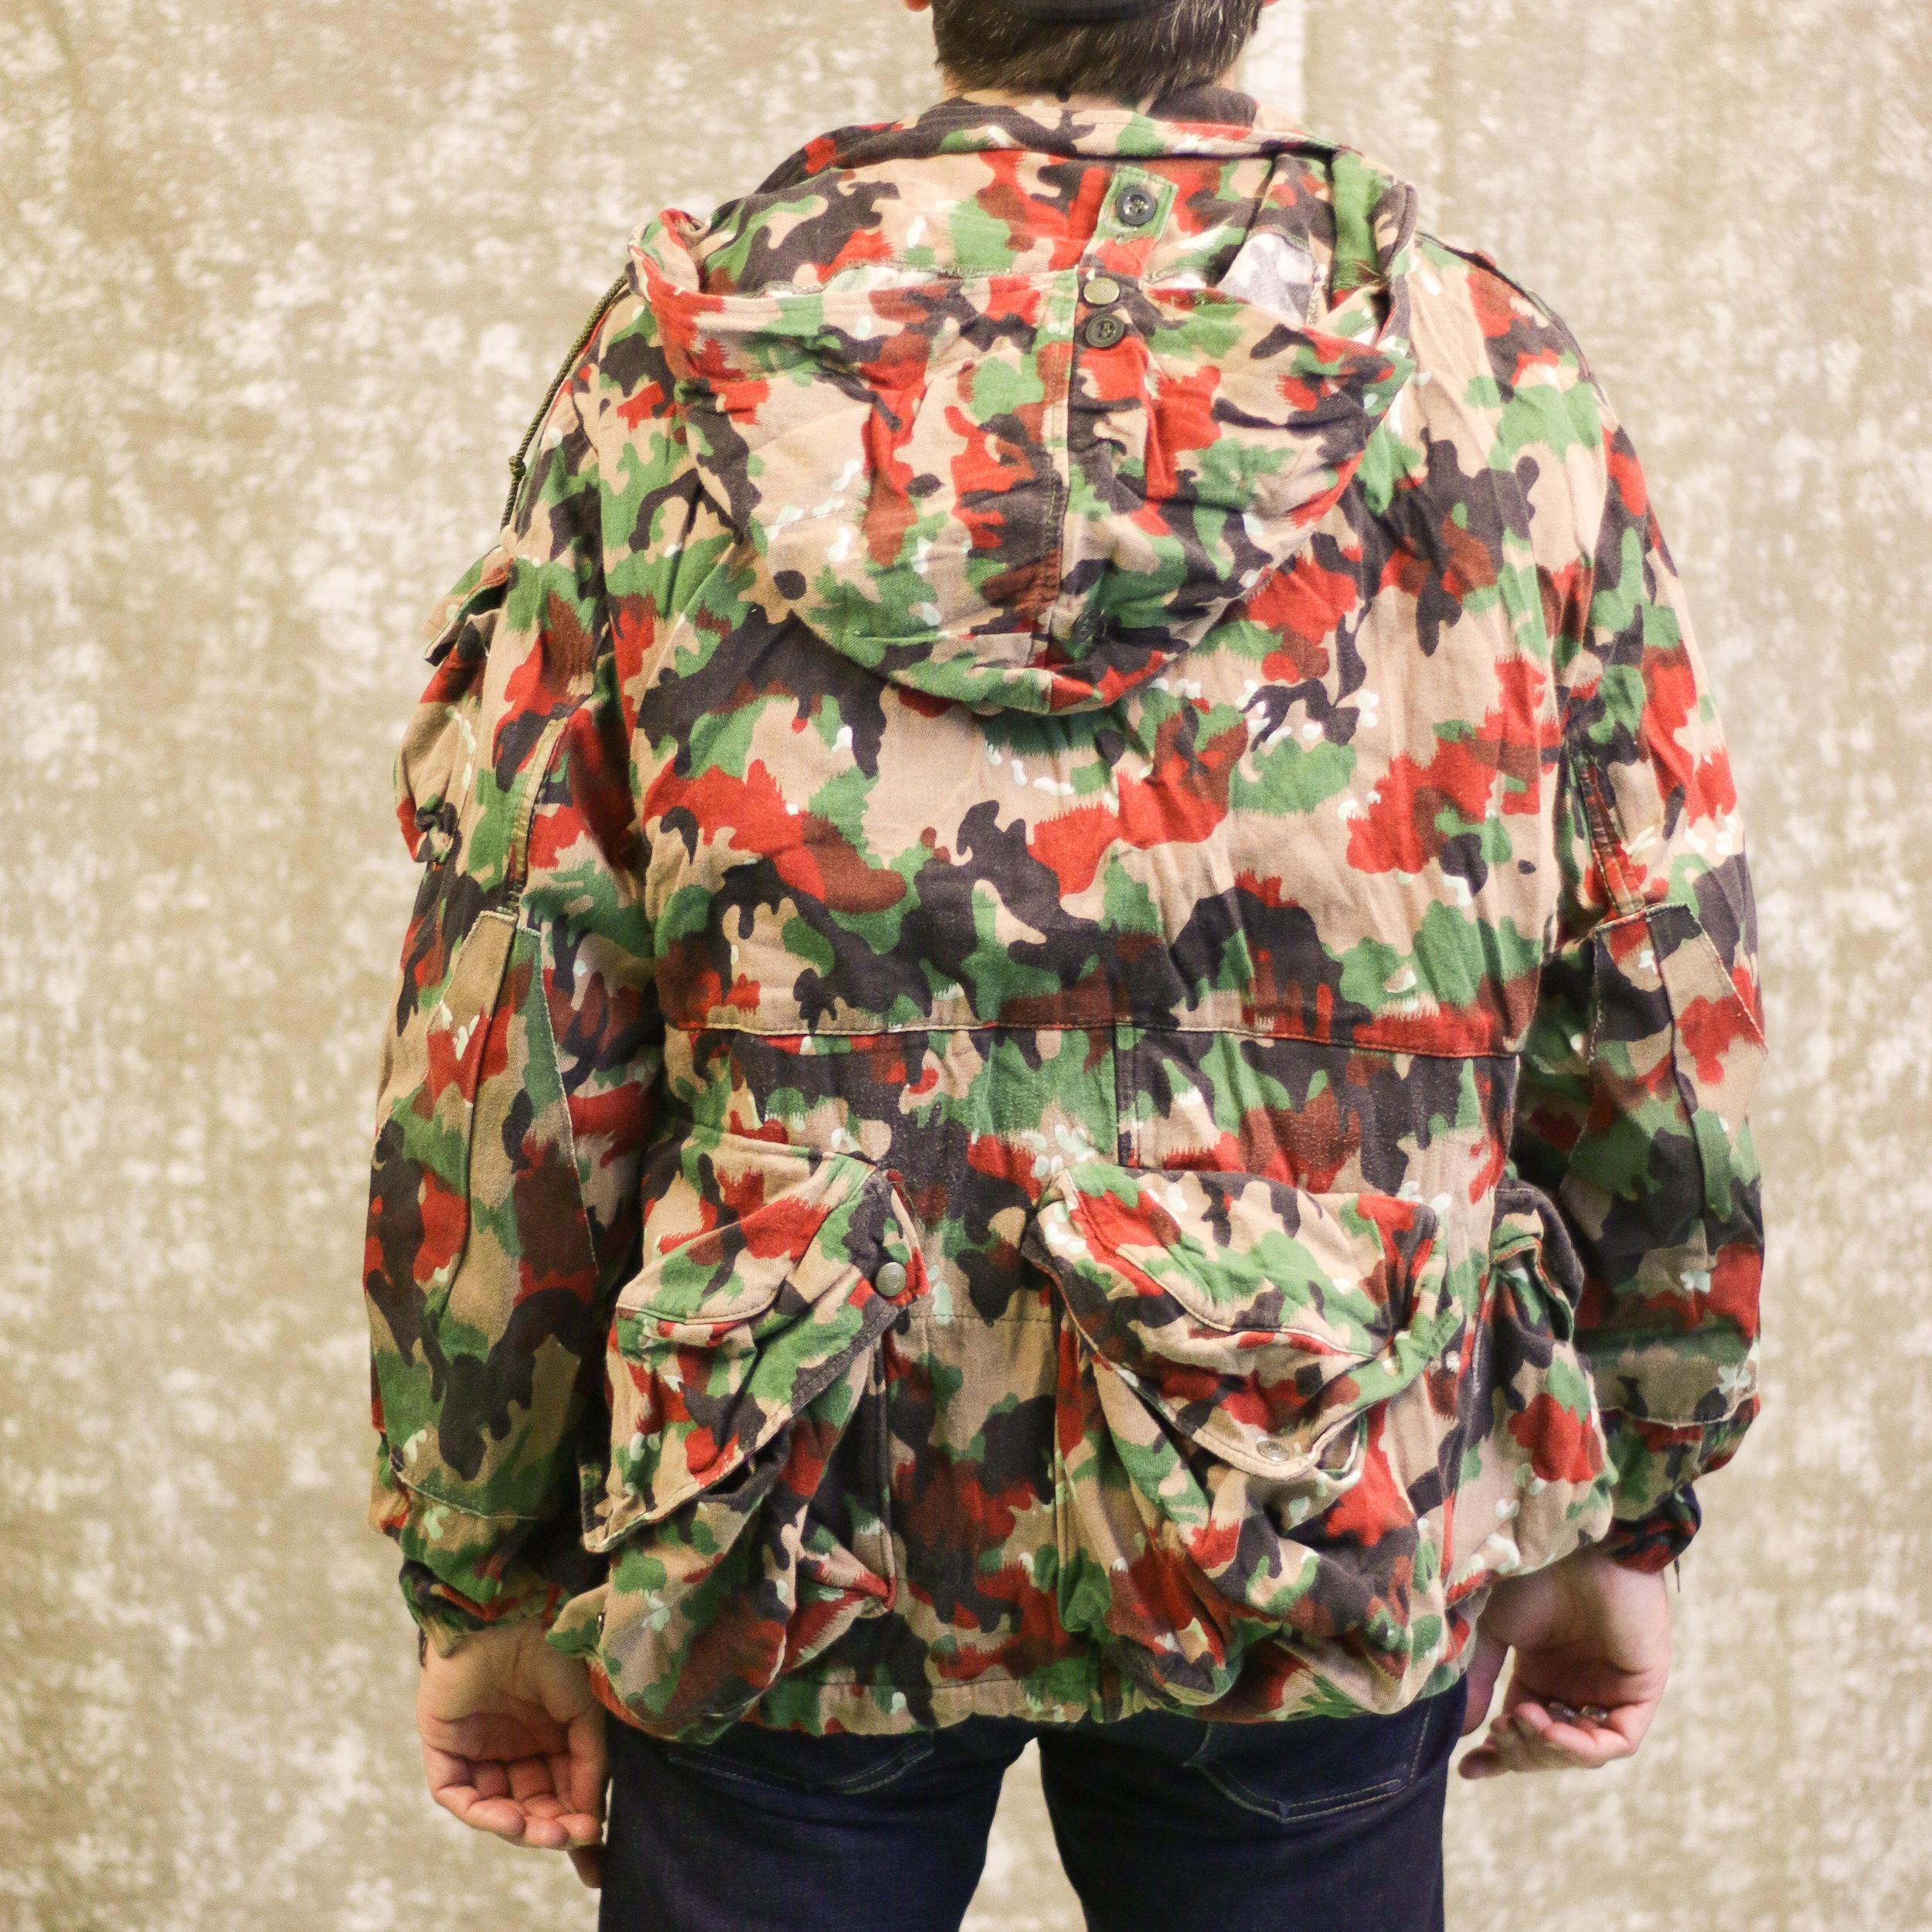 Veste Armee Suisse camouflage Alpenflage arriere